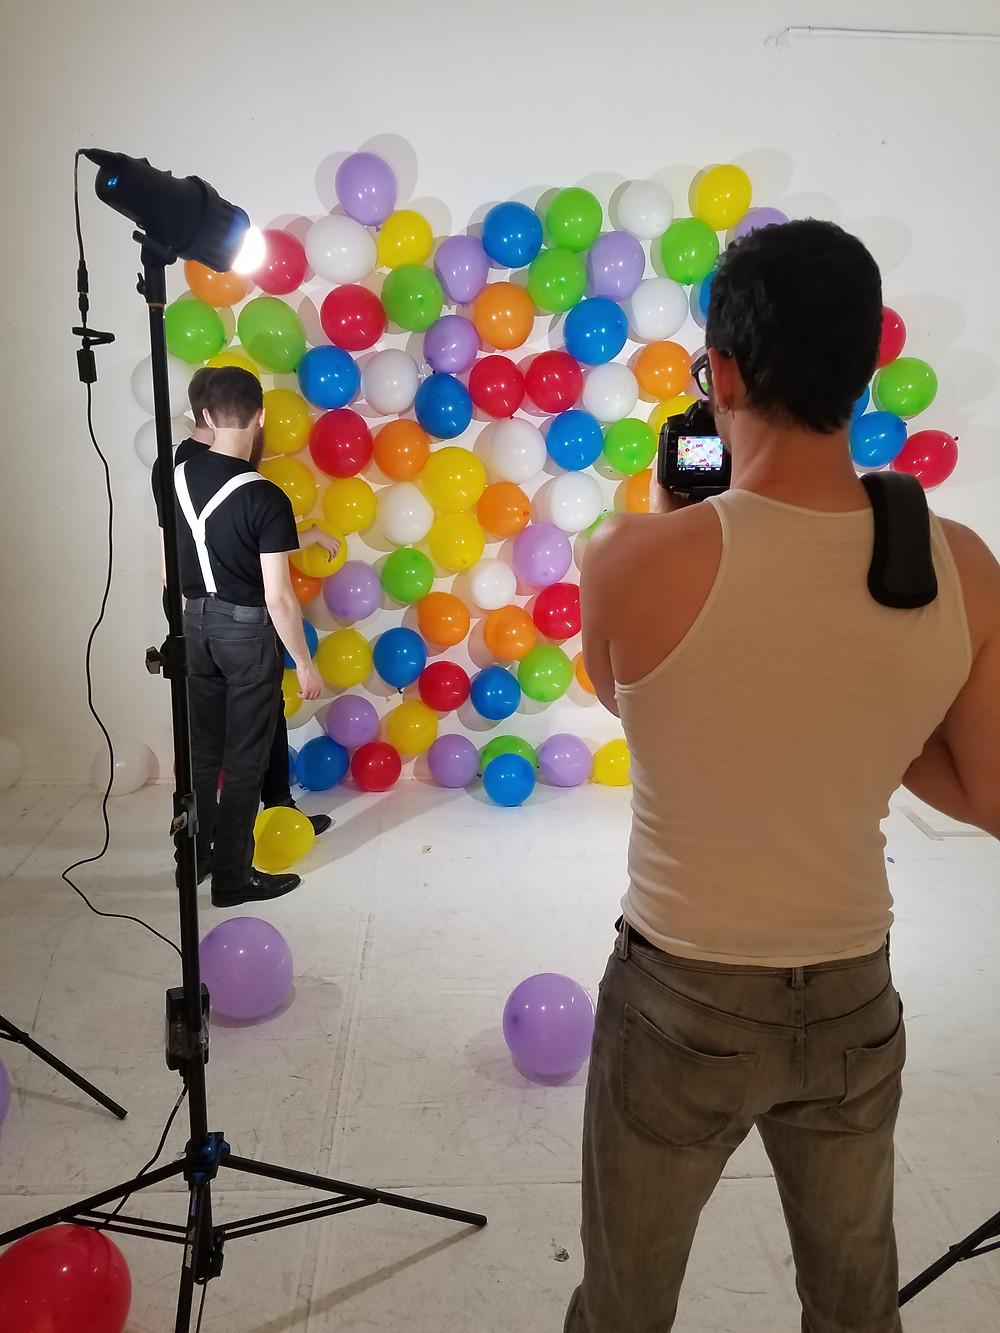 Bradman, the Balloon Wall, Tim Basom and Zach Simao